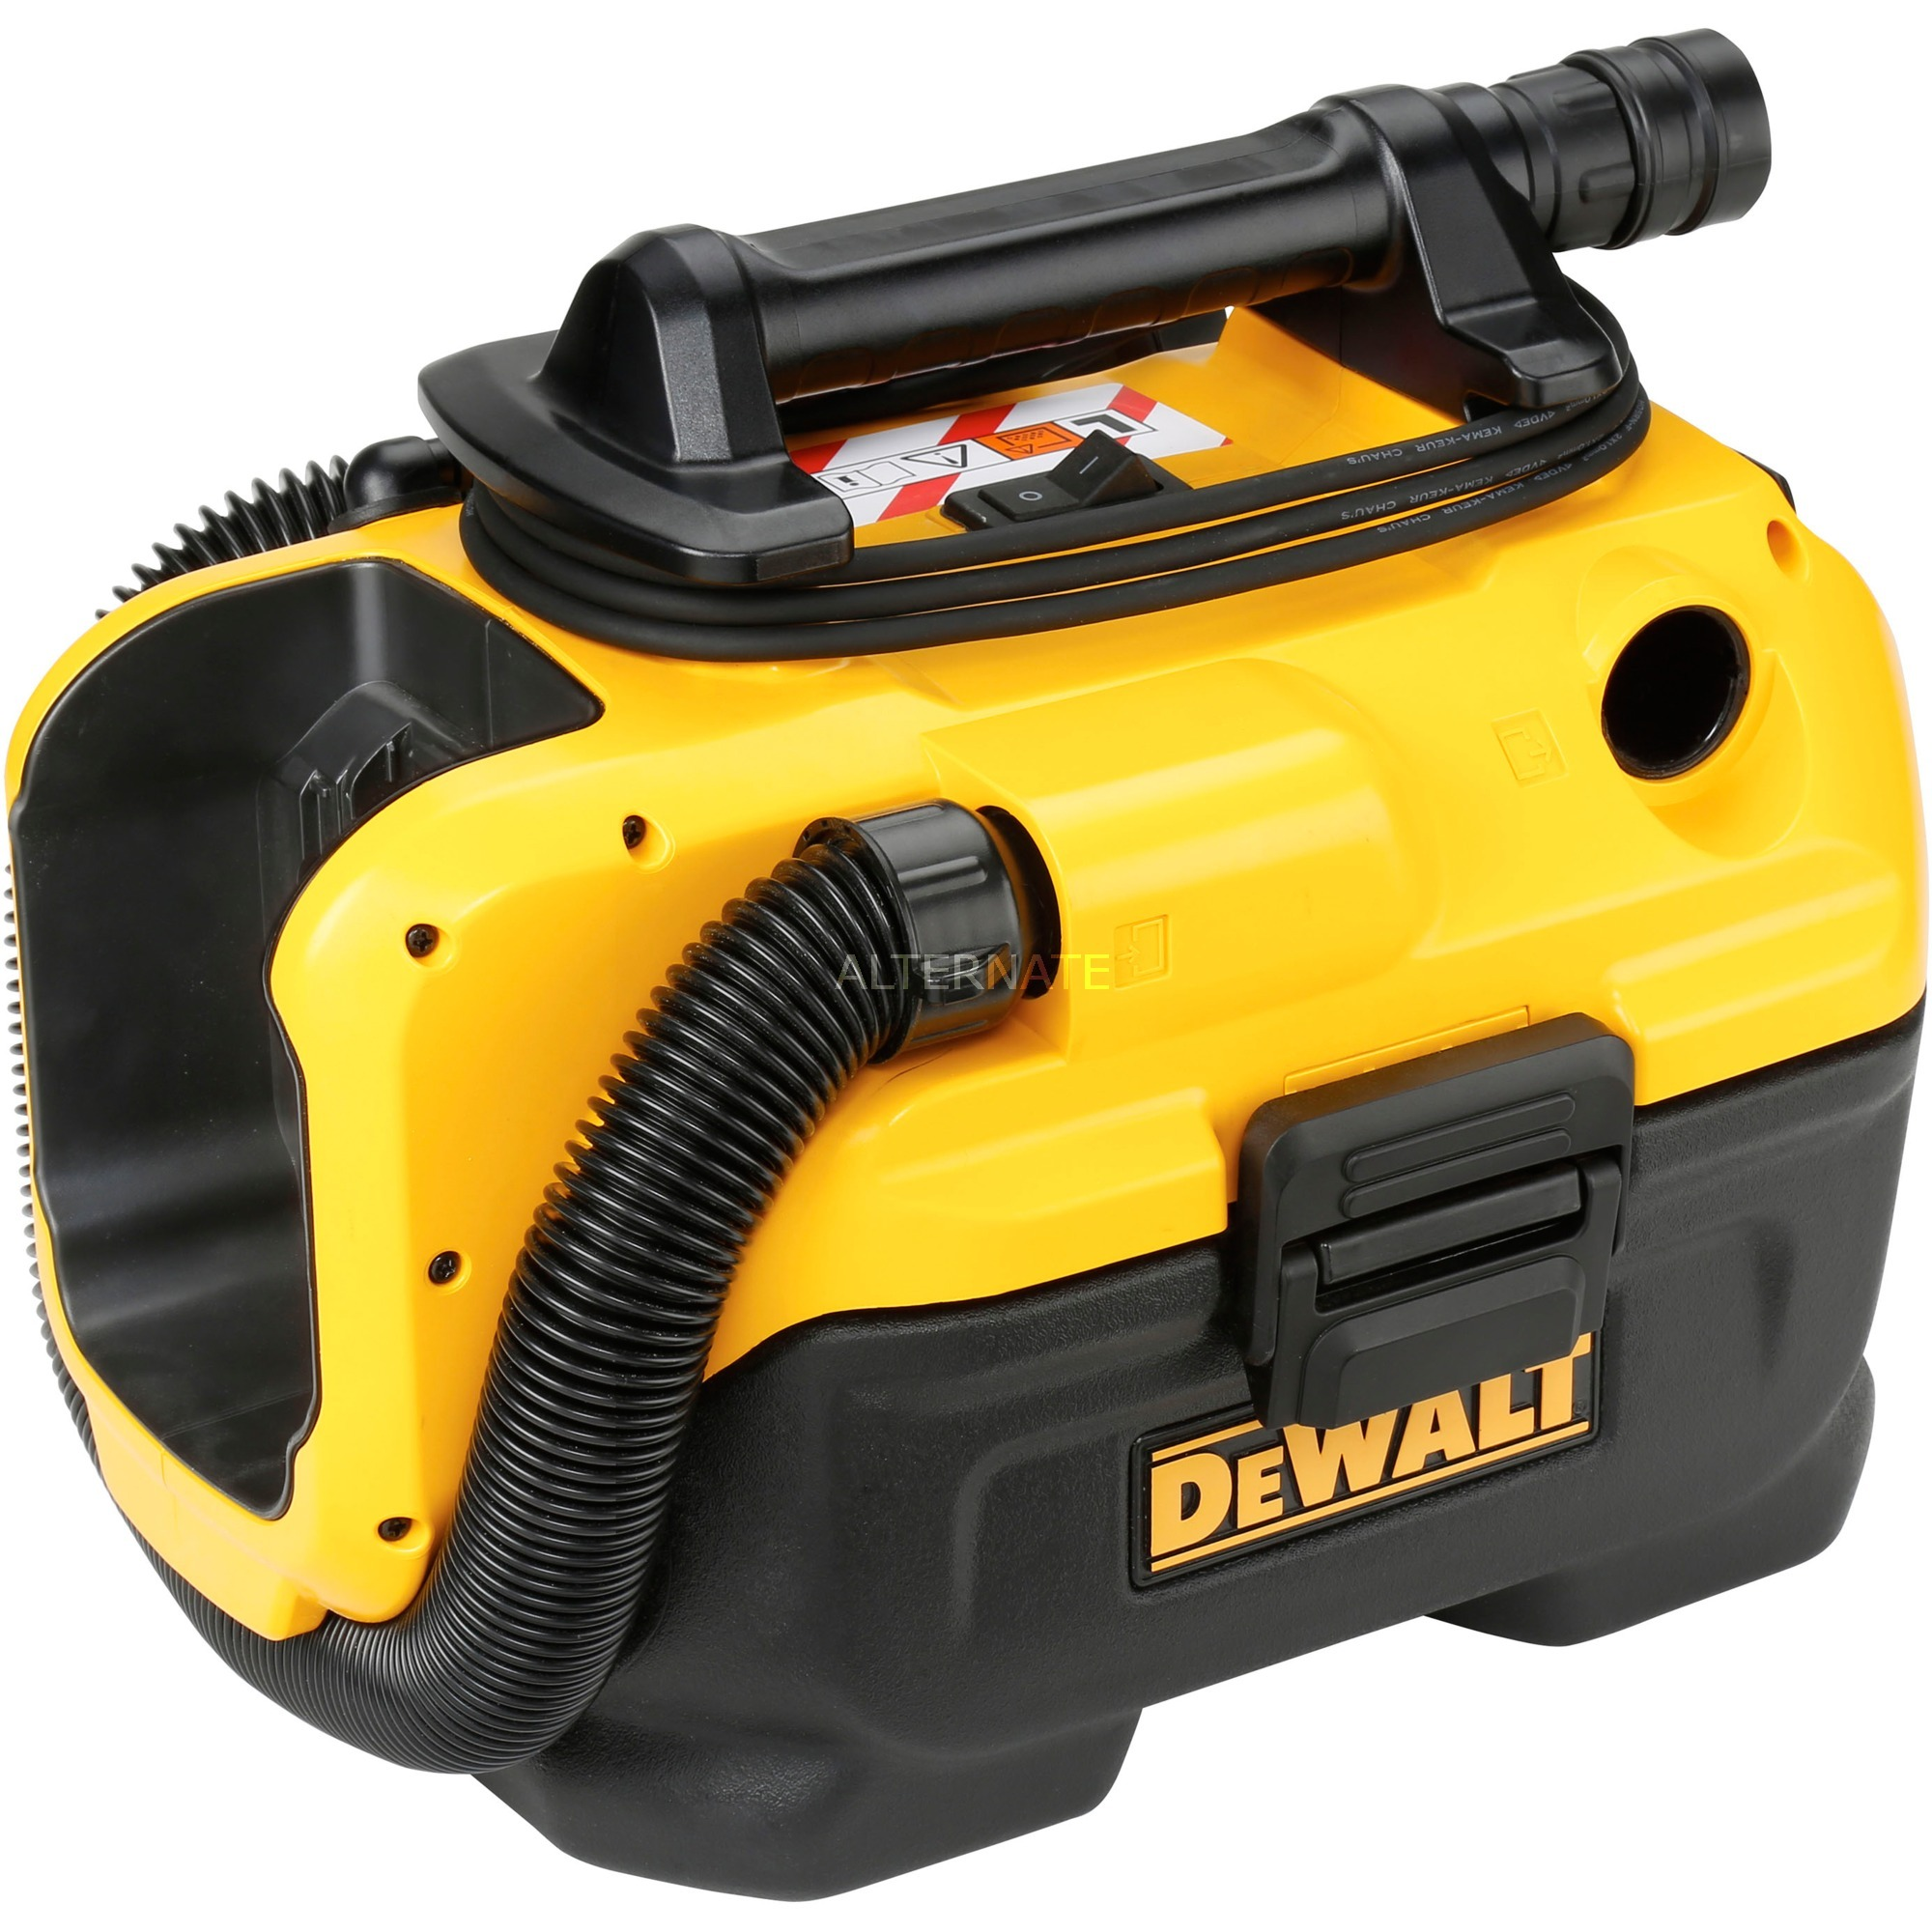 dcv584l-wetdry-vacuum-cleaner